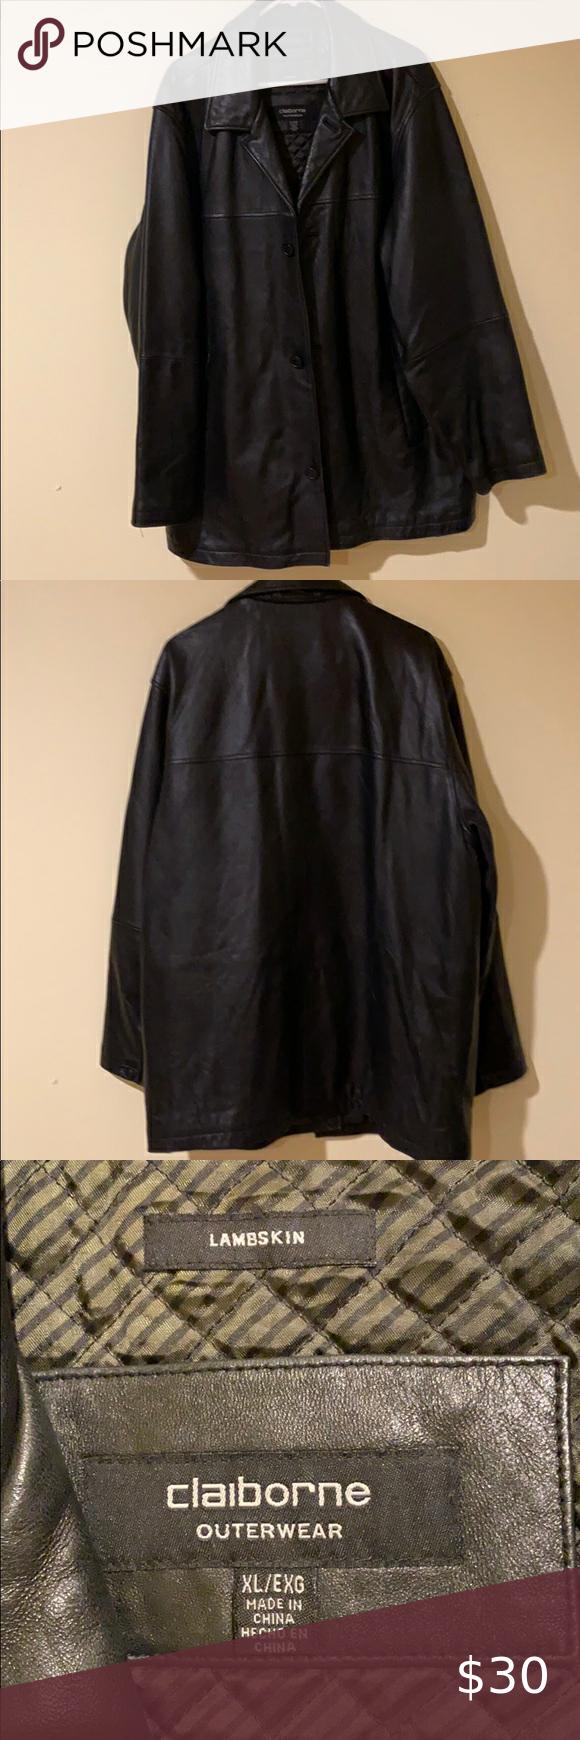 Black Claiborne Lamb Skin Leather Jacket In Great Shape Some Wear On Bottom Of Sleeves Claiborne Jackets Coats Clothes Design Fashion Leather Jacket [ 1740 x 580 Pixel ]